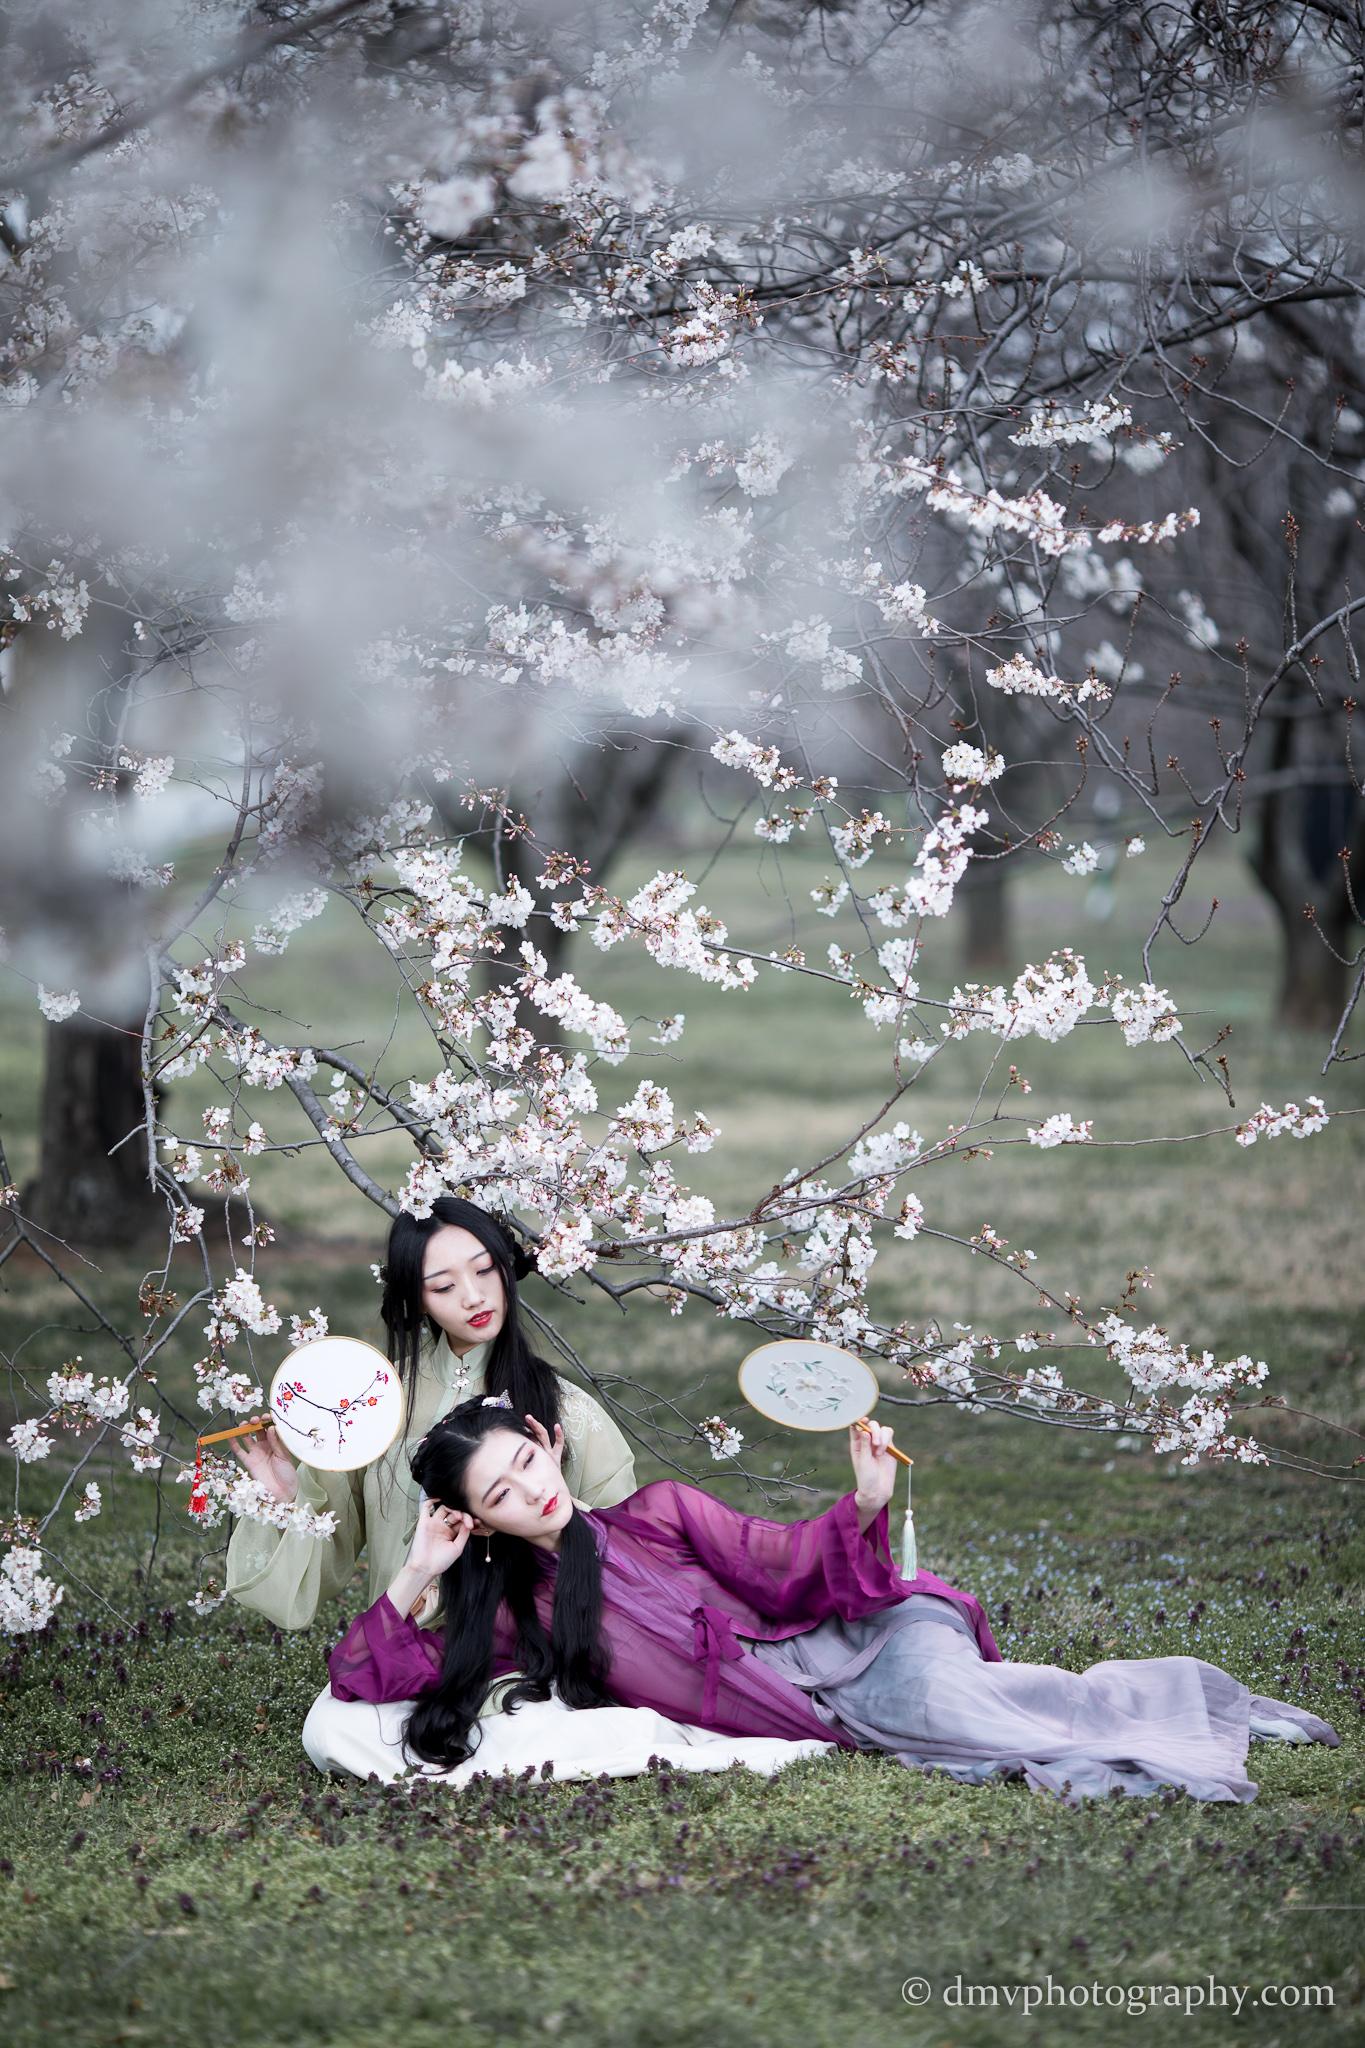 2017-03-25 - Day Cherry Blossom - 00143